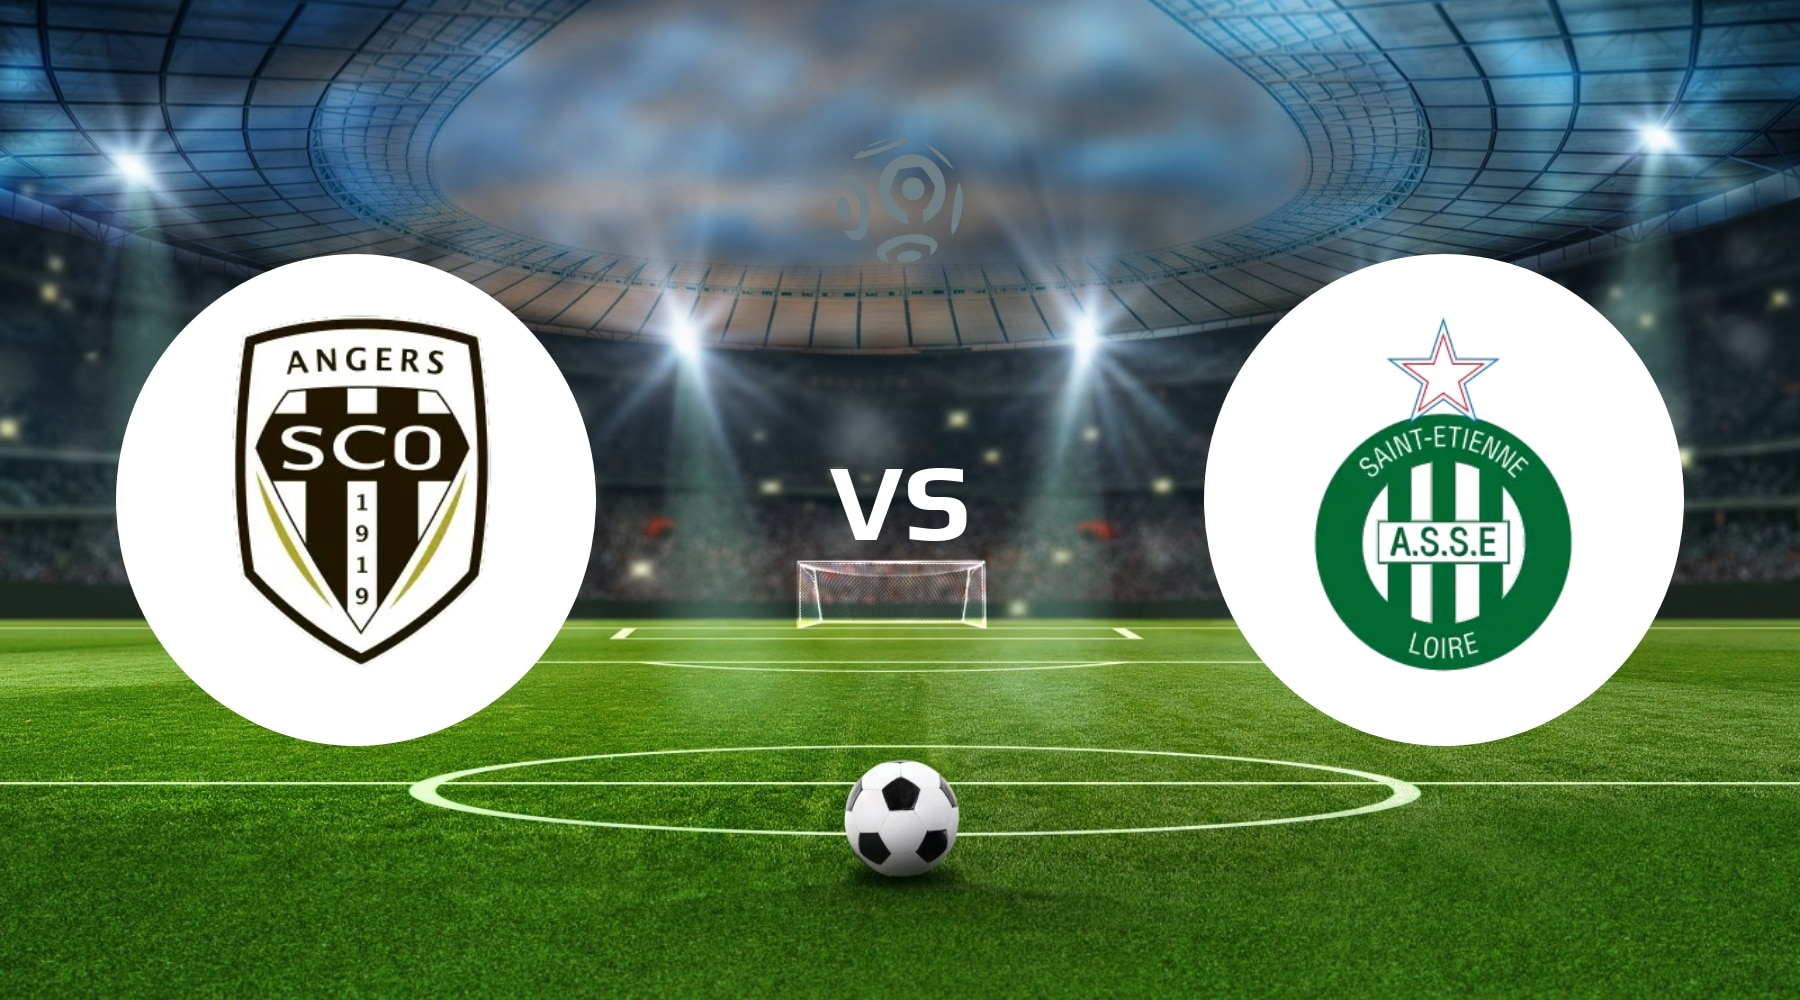 Angers vs Saint-Étienne Betting